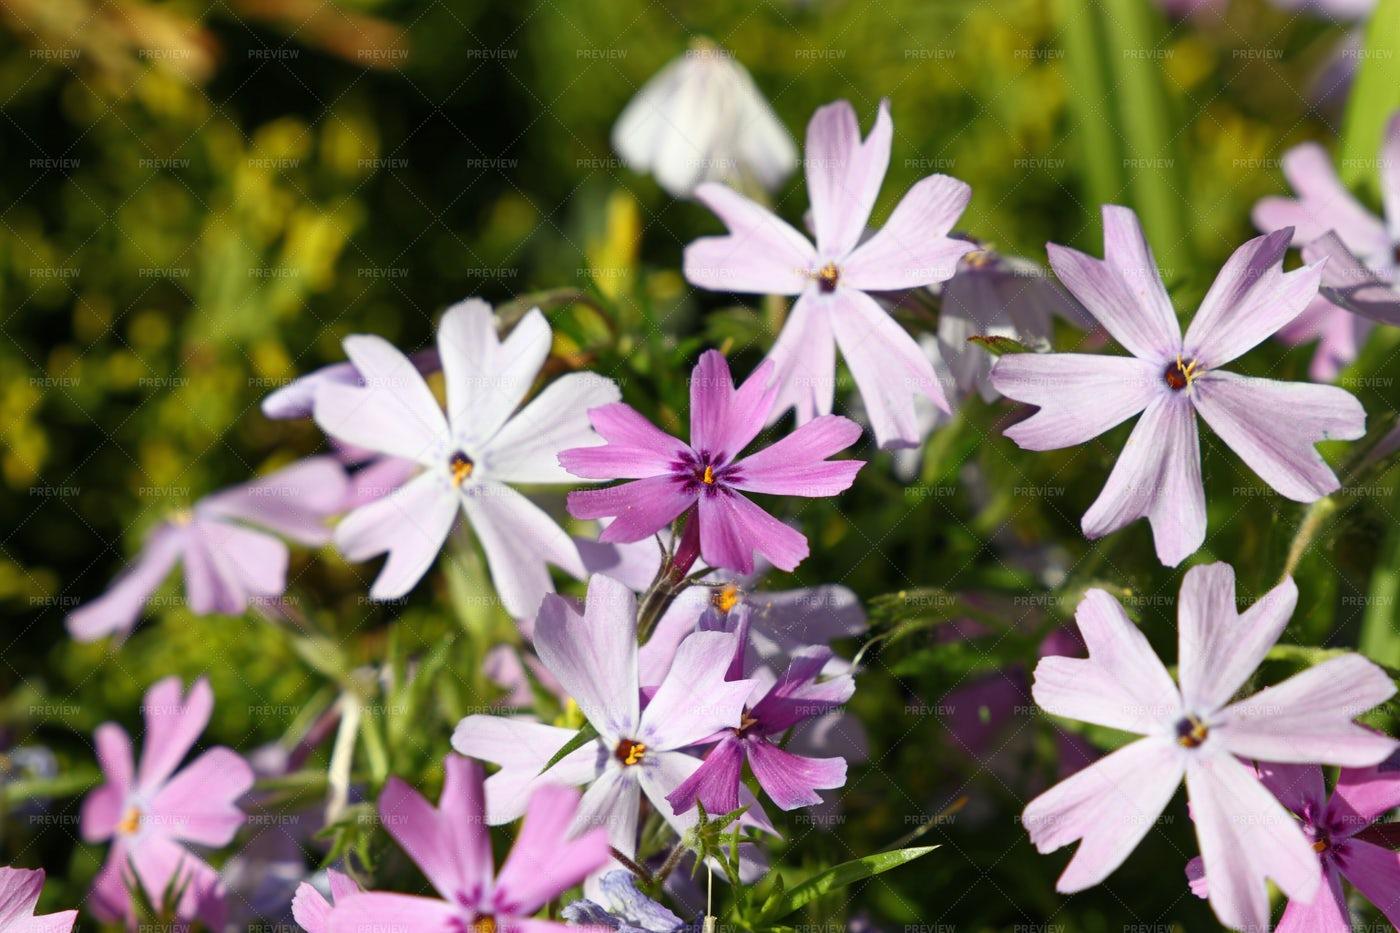 Purple Meadow Mallow Flowers: Stock Photos